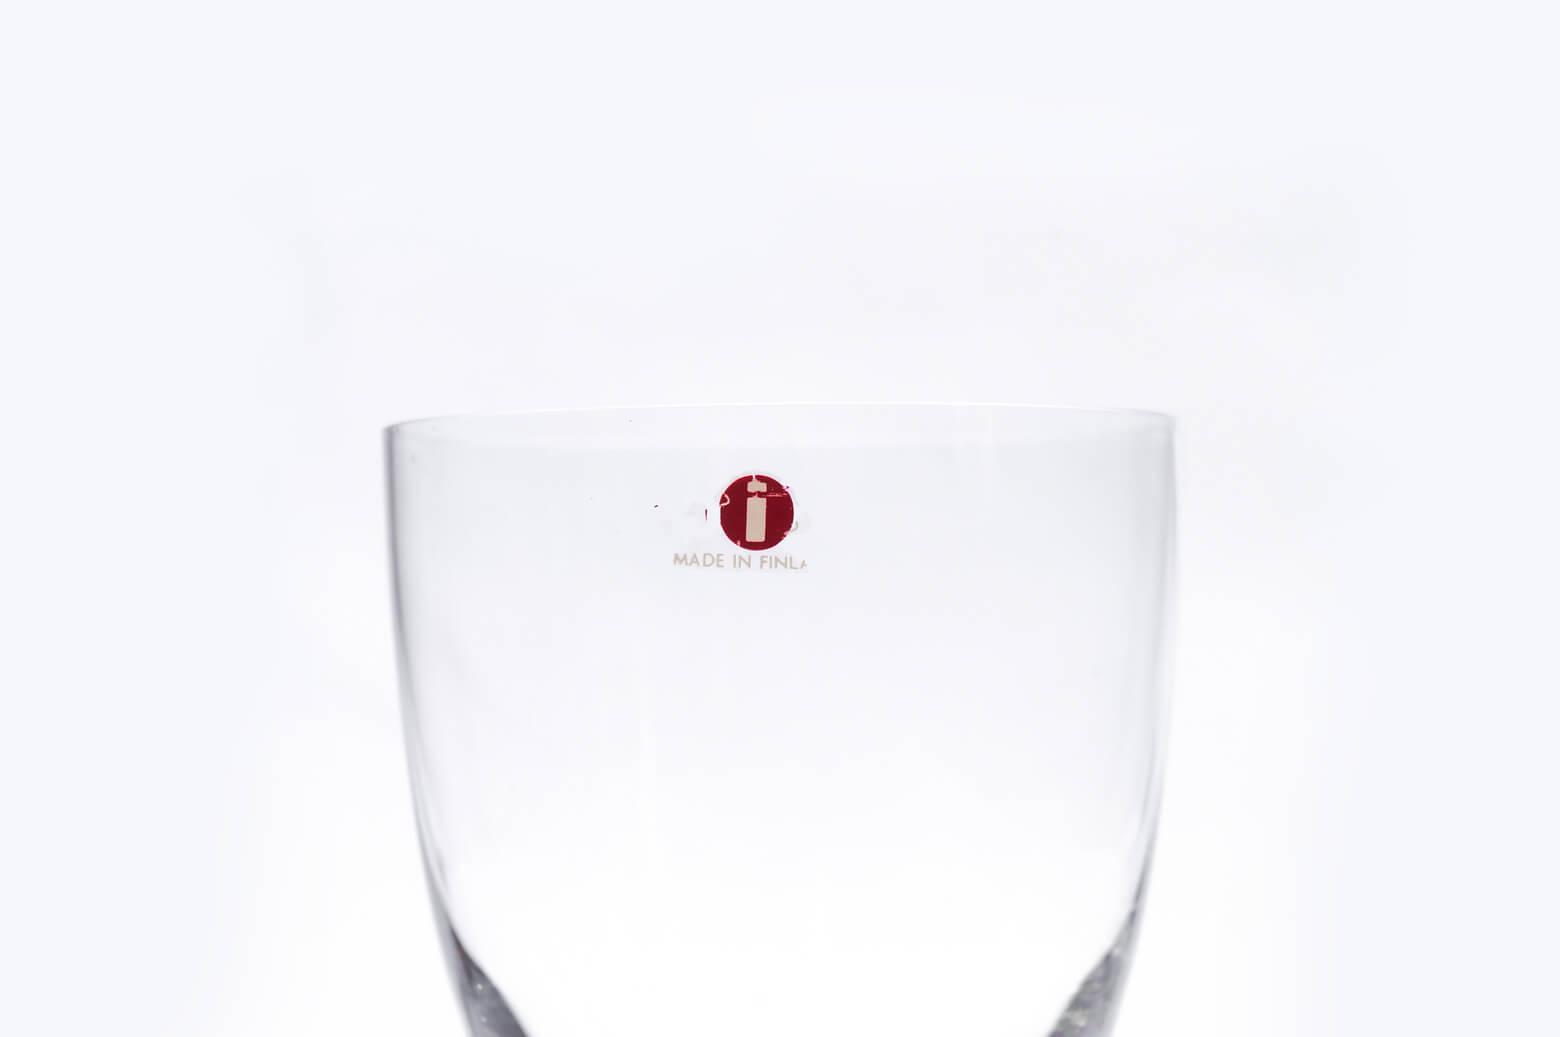 iittala Tapio Wirkkala Red Wine Glass /イッタラ タピオ・ヴィルカラ レッド ワイン グラス 250ml 北欧食器 フィンランド 5